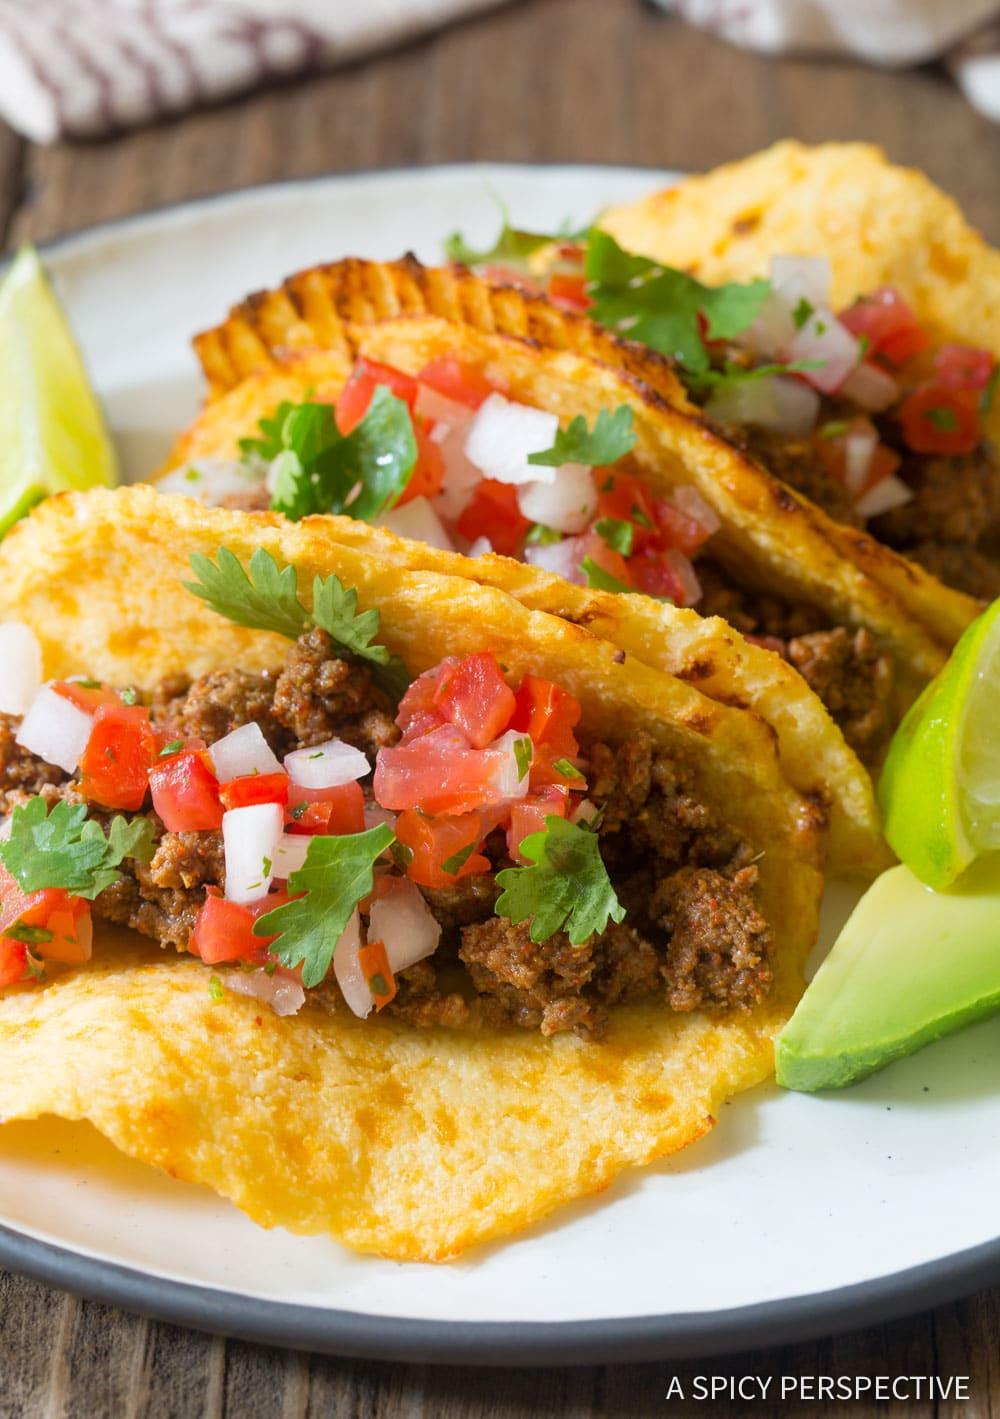 Low Carb Keto Soup Recipes  Low Carb Keto Tortilla Recipe A Spicy Perspective